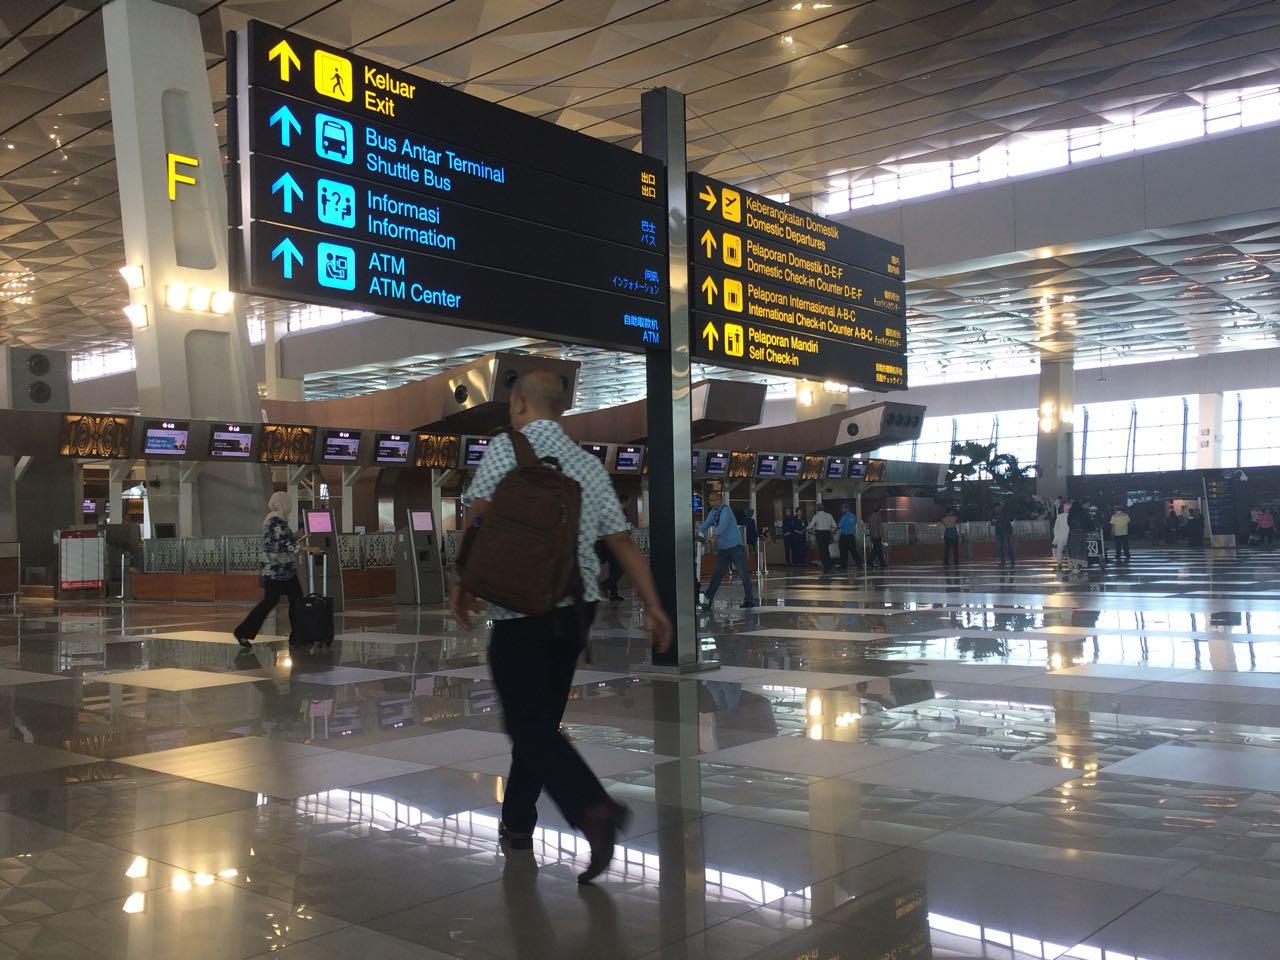 https: img.okezone.com content 2020 09 20 320 2280793 proyek-bandara-dan-pelabuhan-di-labuan-bajo-tetap-berjalan-yCttb15dGF.jpg